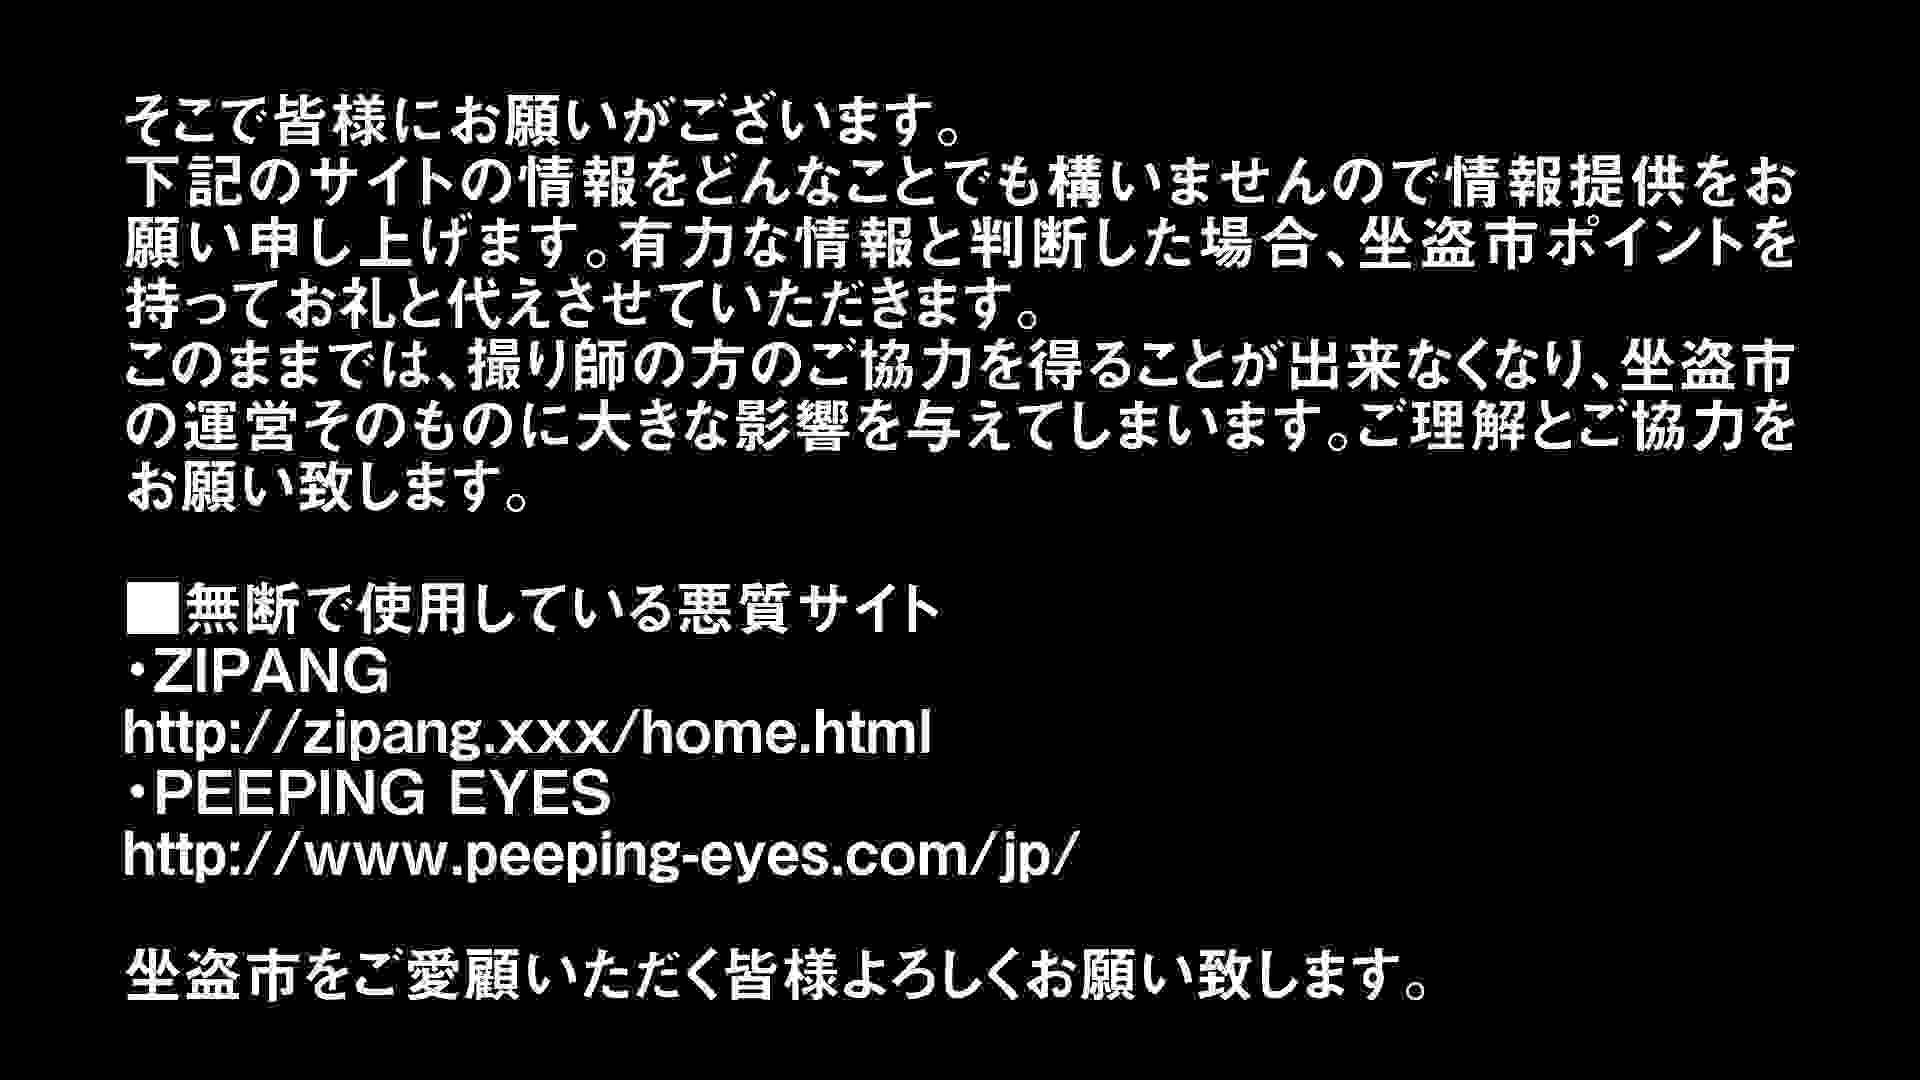 Aquaな露天風呂Vol.299 盗撮シリーズ | 露天風呂編  82PIX 25